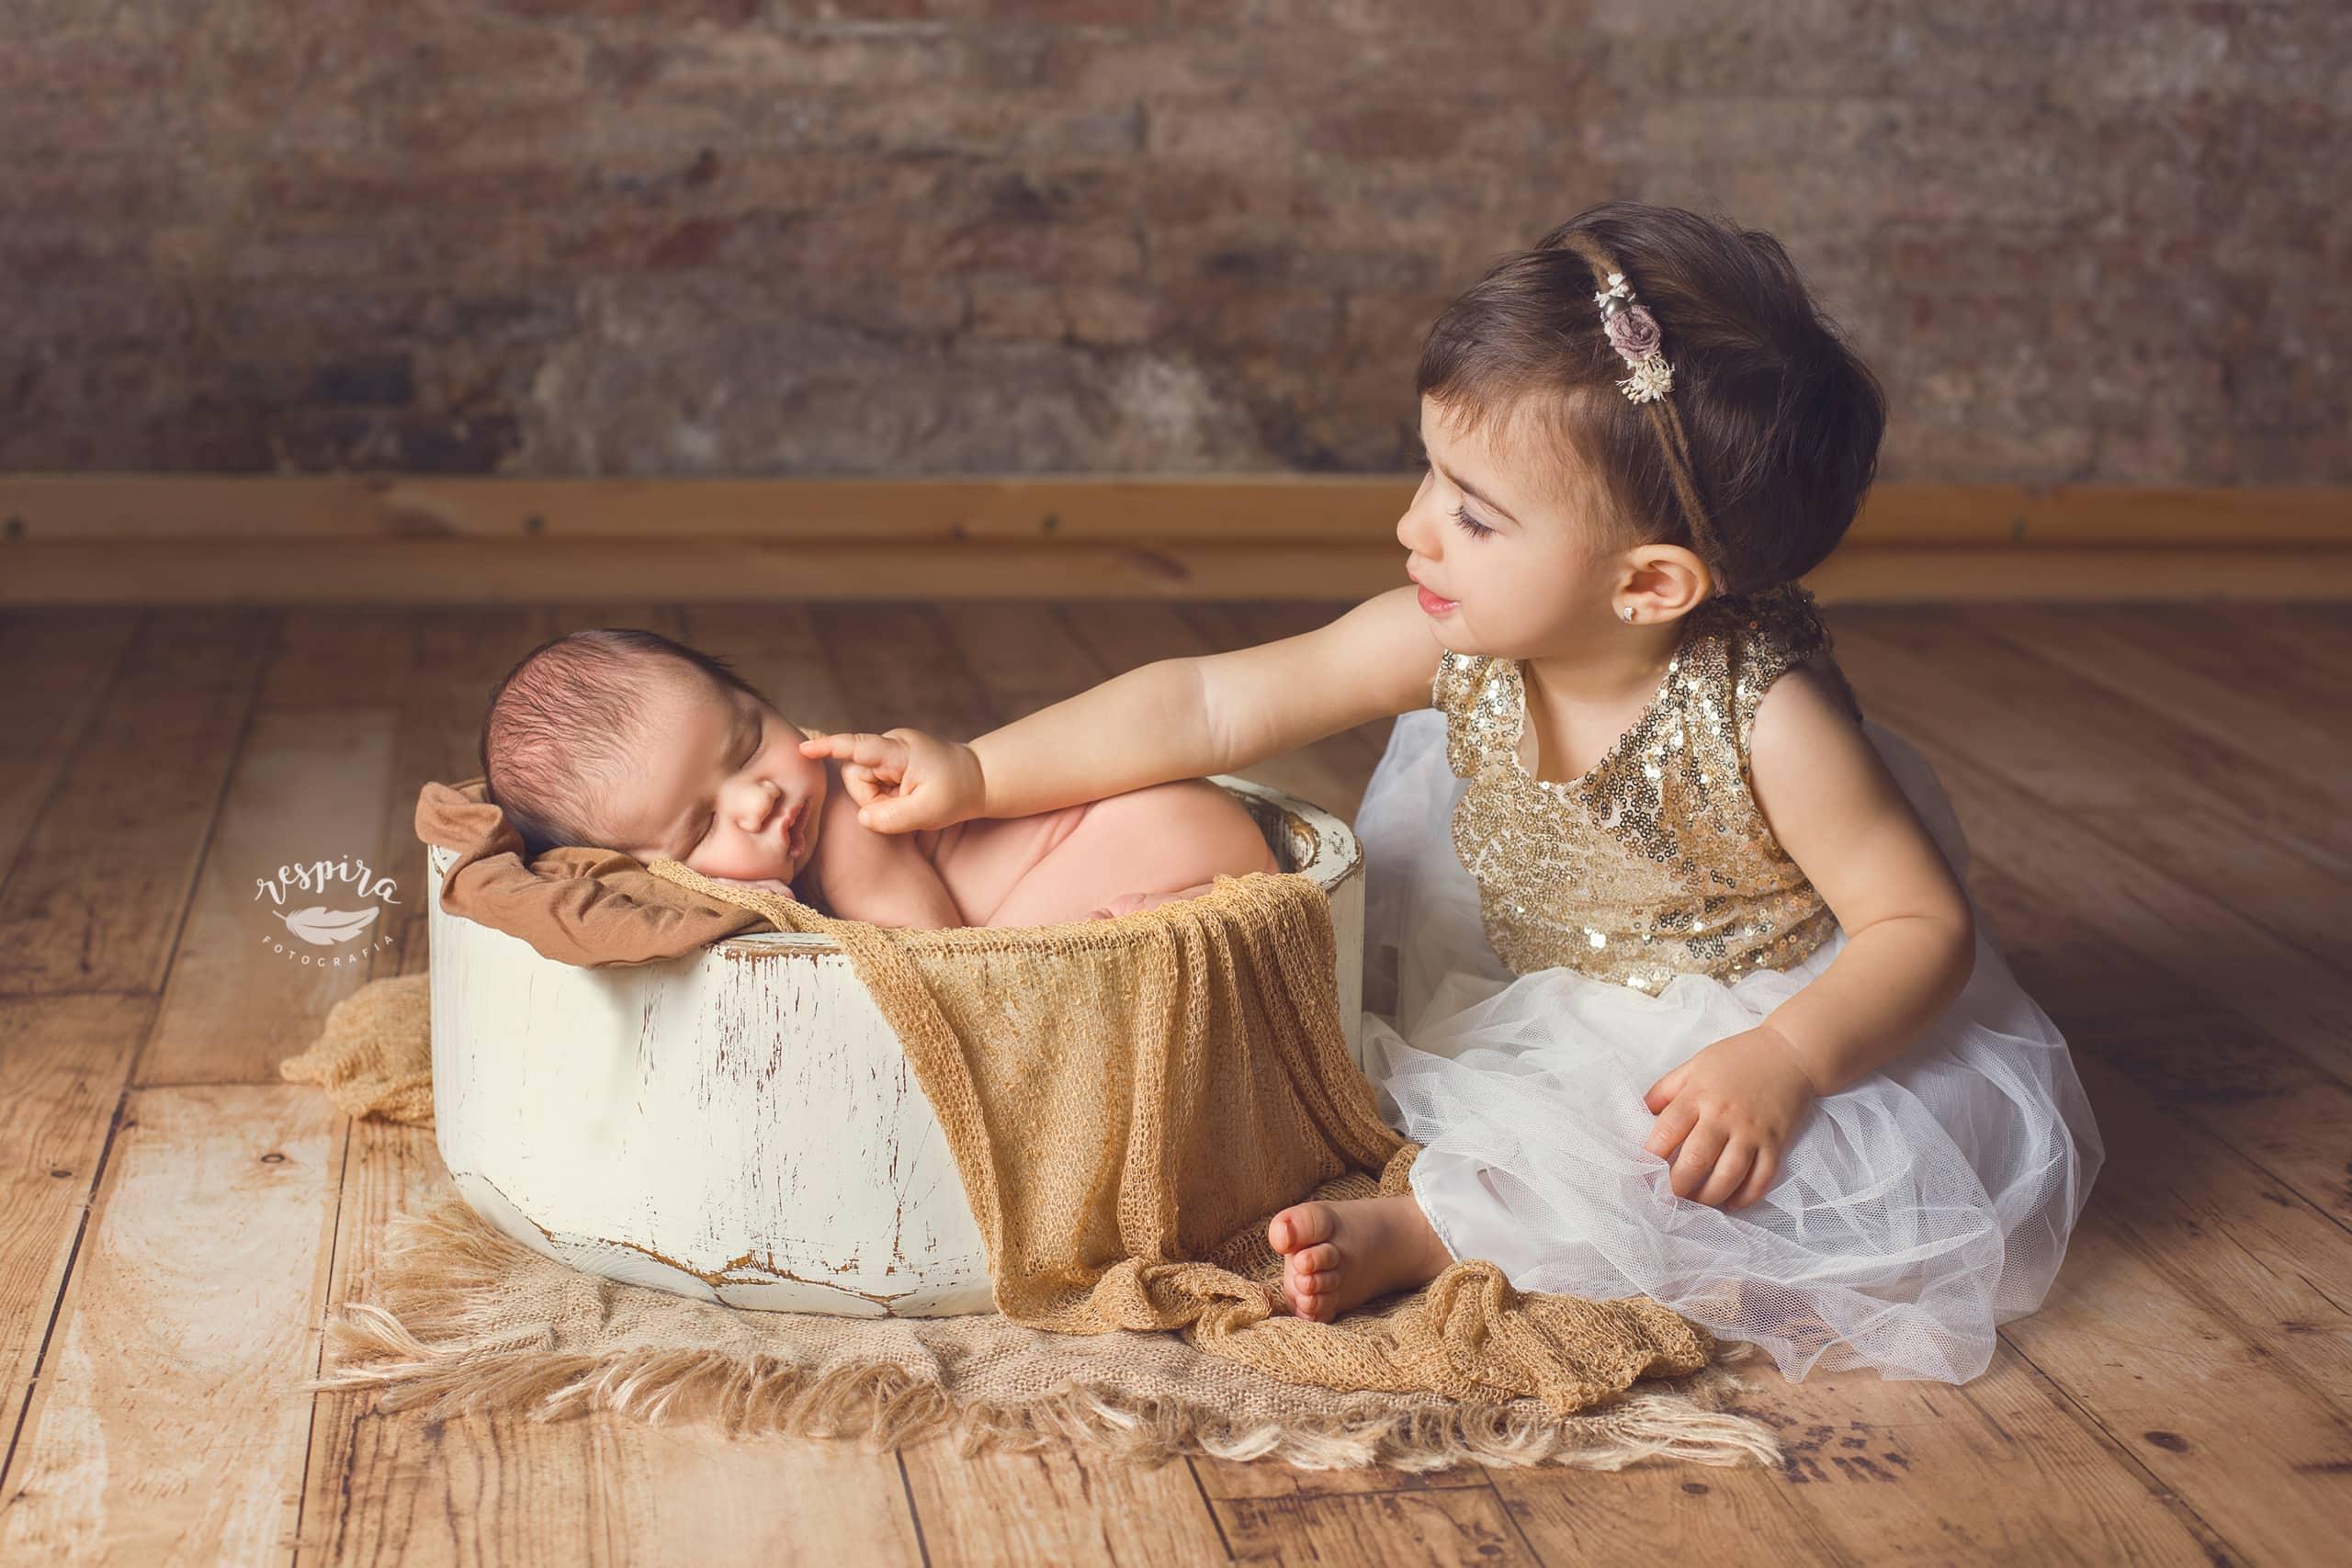 Fotografo de recien nacido newborn en barcelona olesa